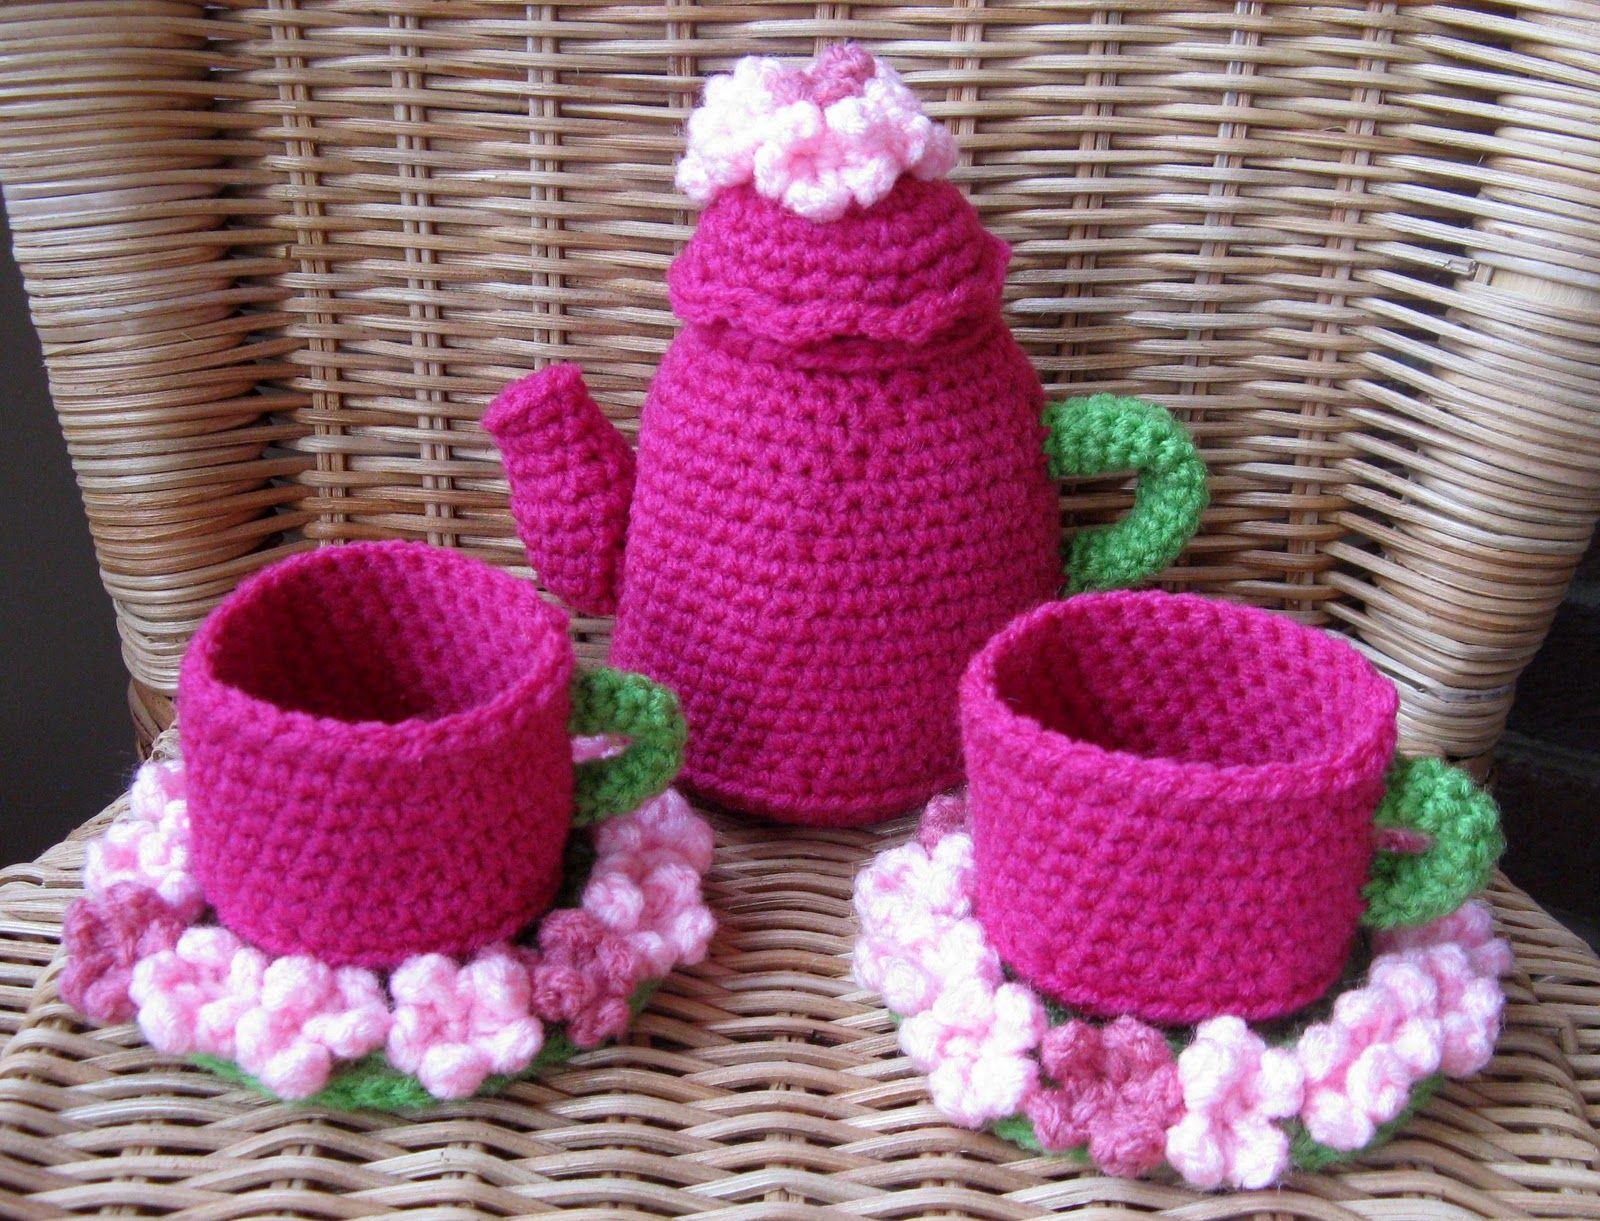 Ravelrycrochetfreepatterns ravelry free crochet amigurumi ravelrycrochetfreepatterns ravelry free crochet amigurumi patterns bankloansurffo Image collections